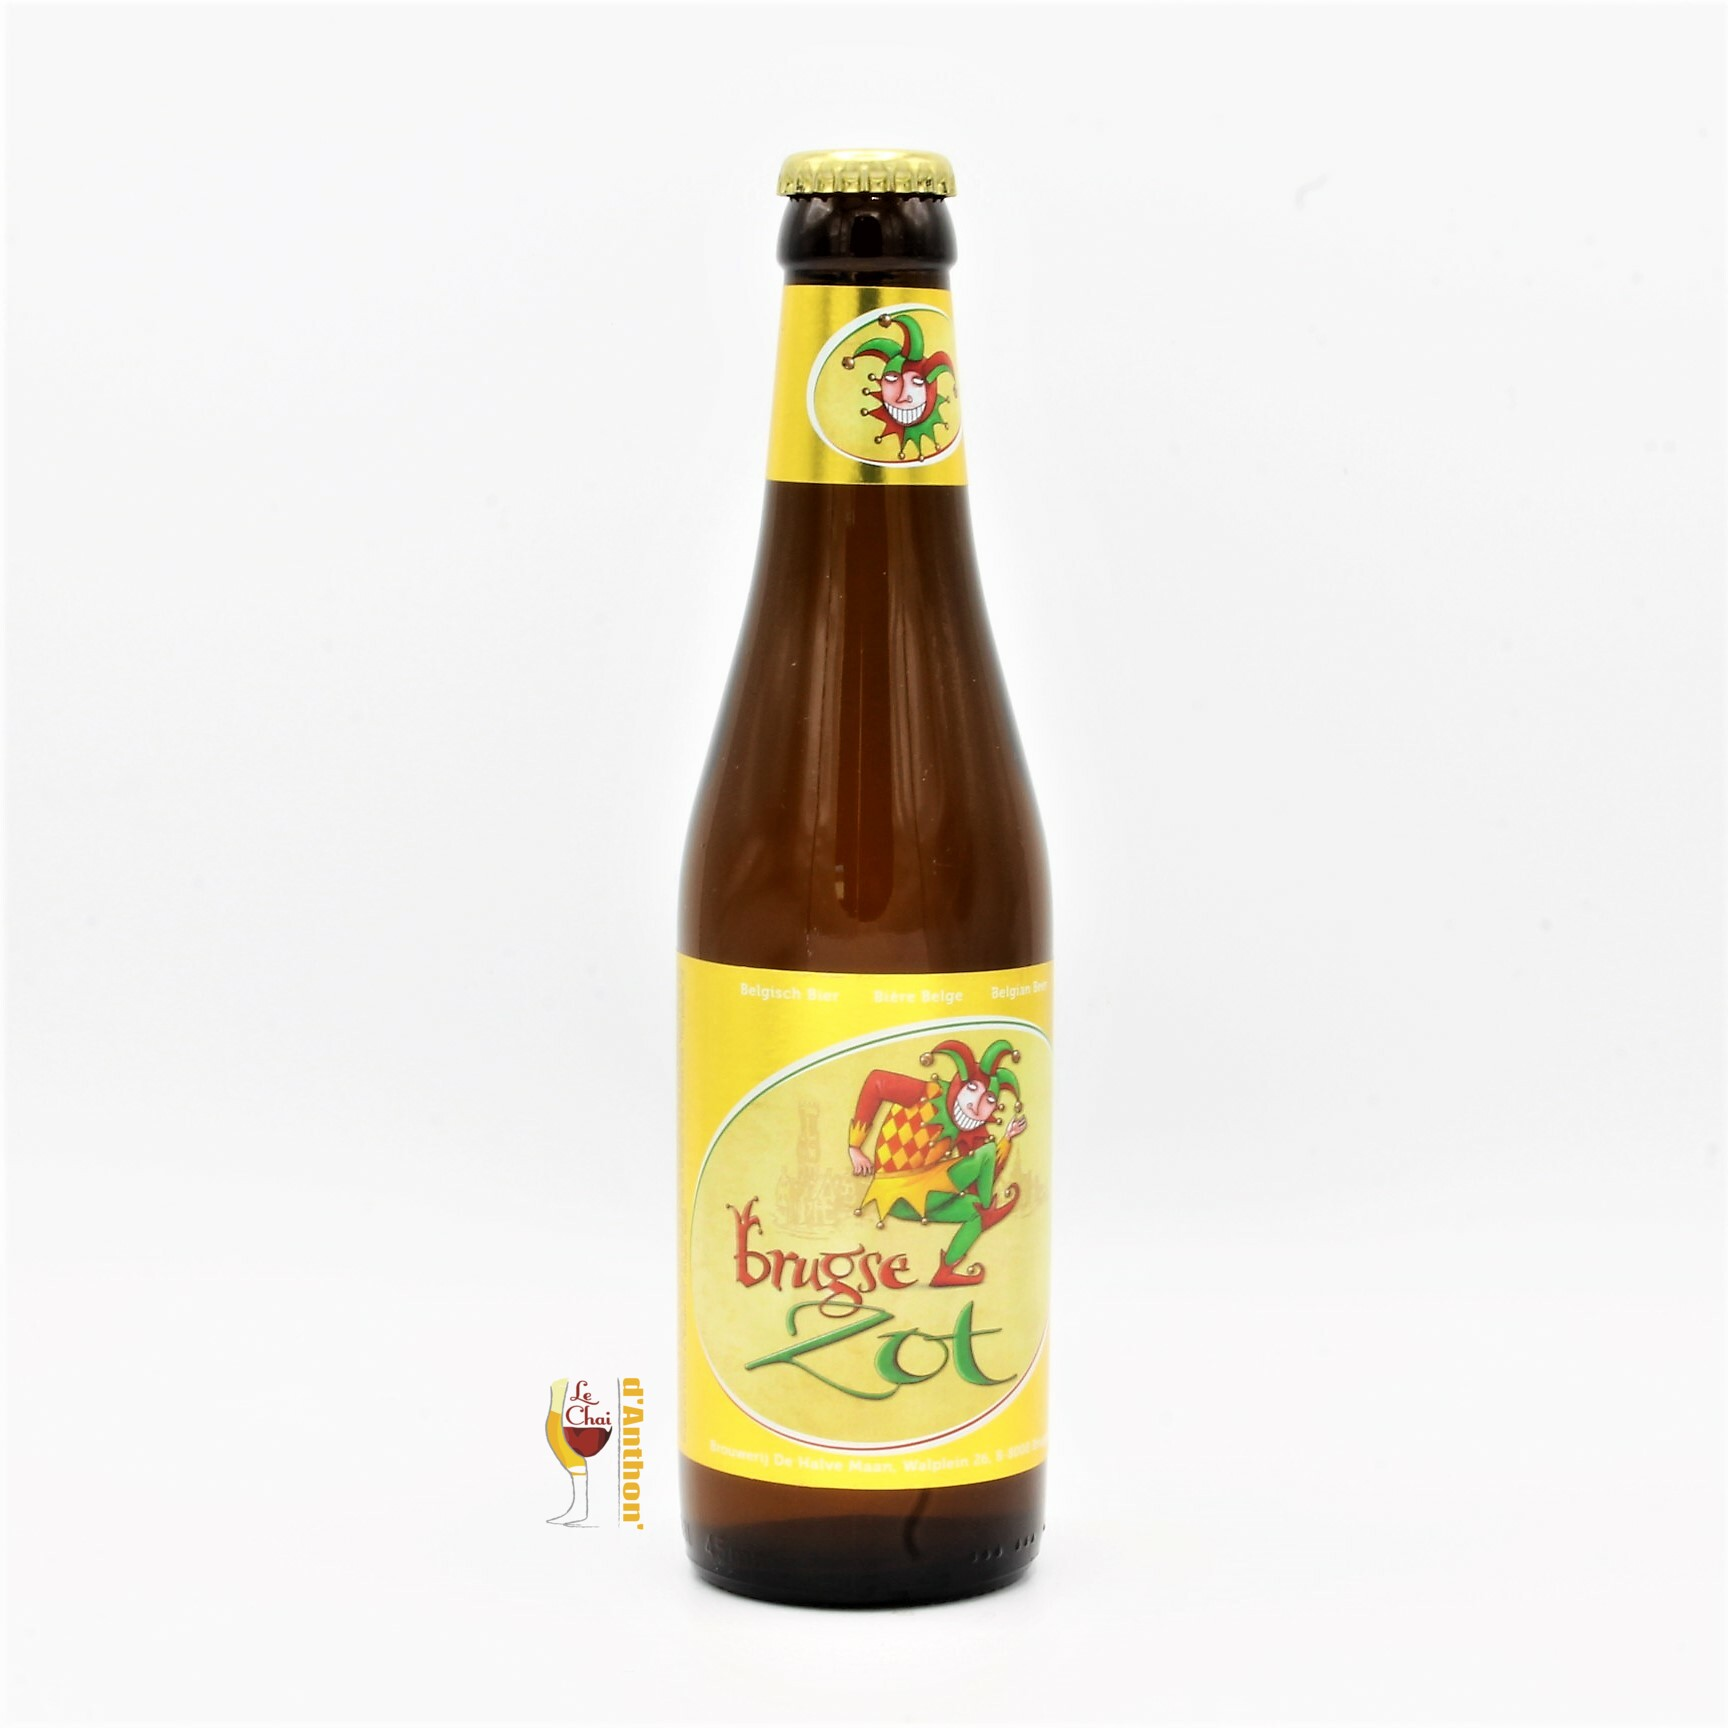 Le Chai D&765.JPG039;Anthon Biere Bouteille Blonde Brasserie De Halve Maan Brugse Zot Belge 33cl 765